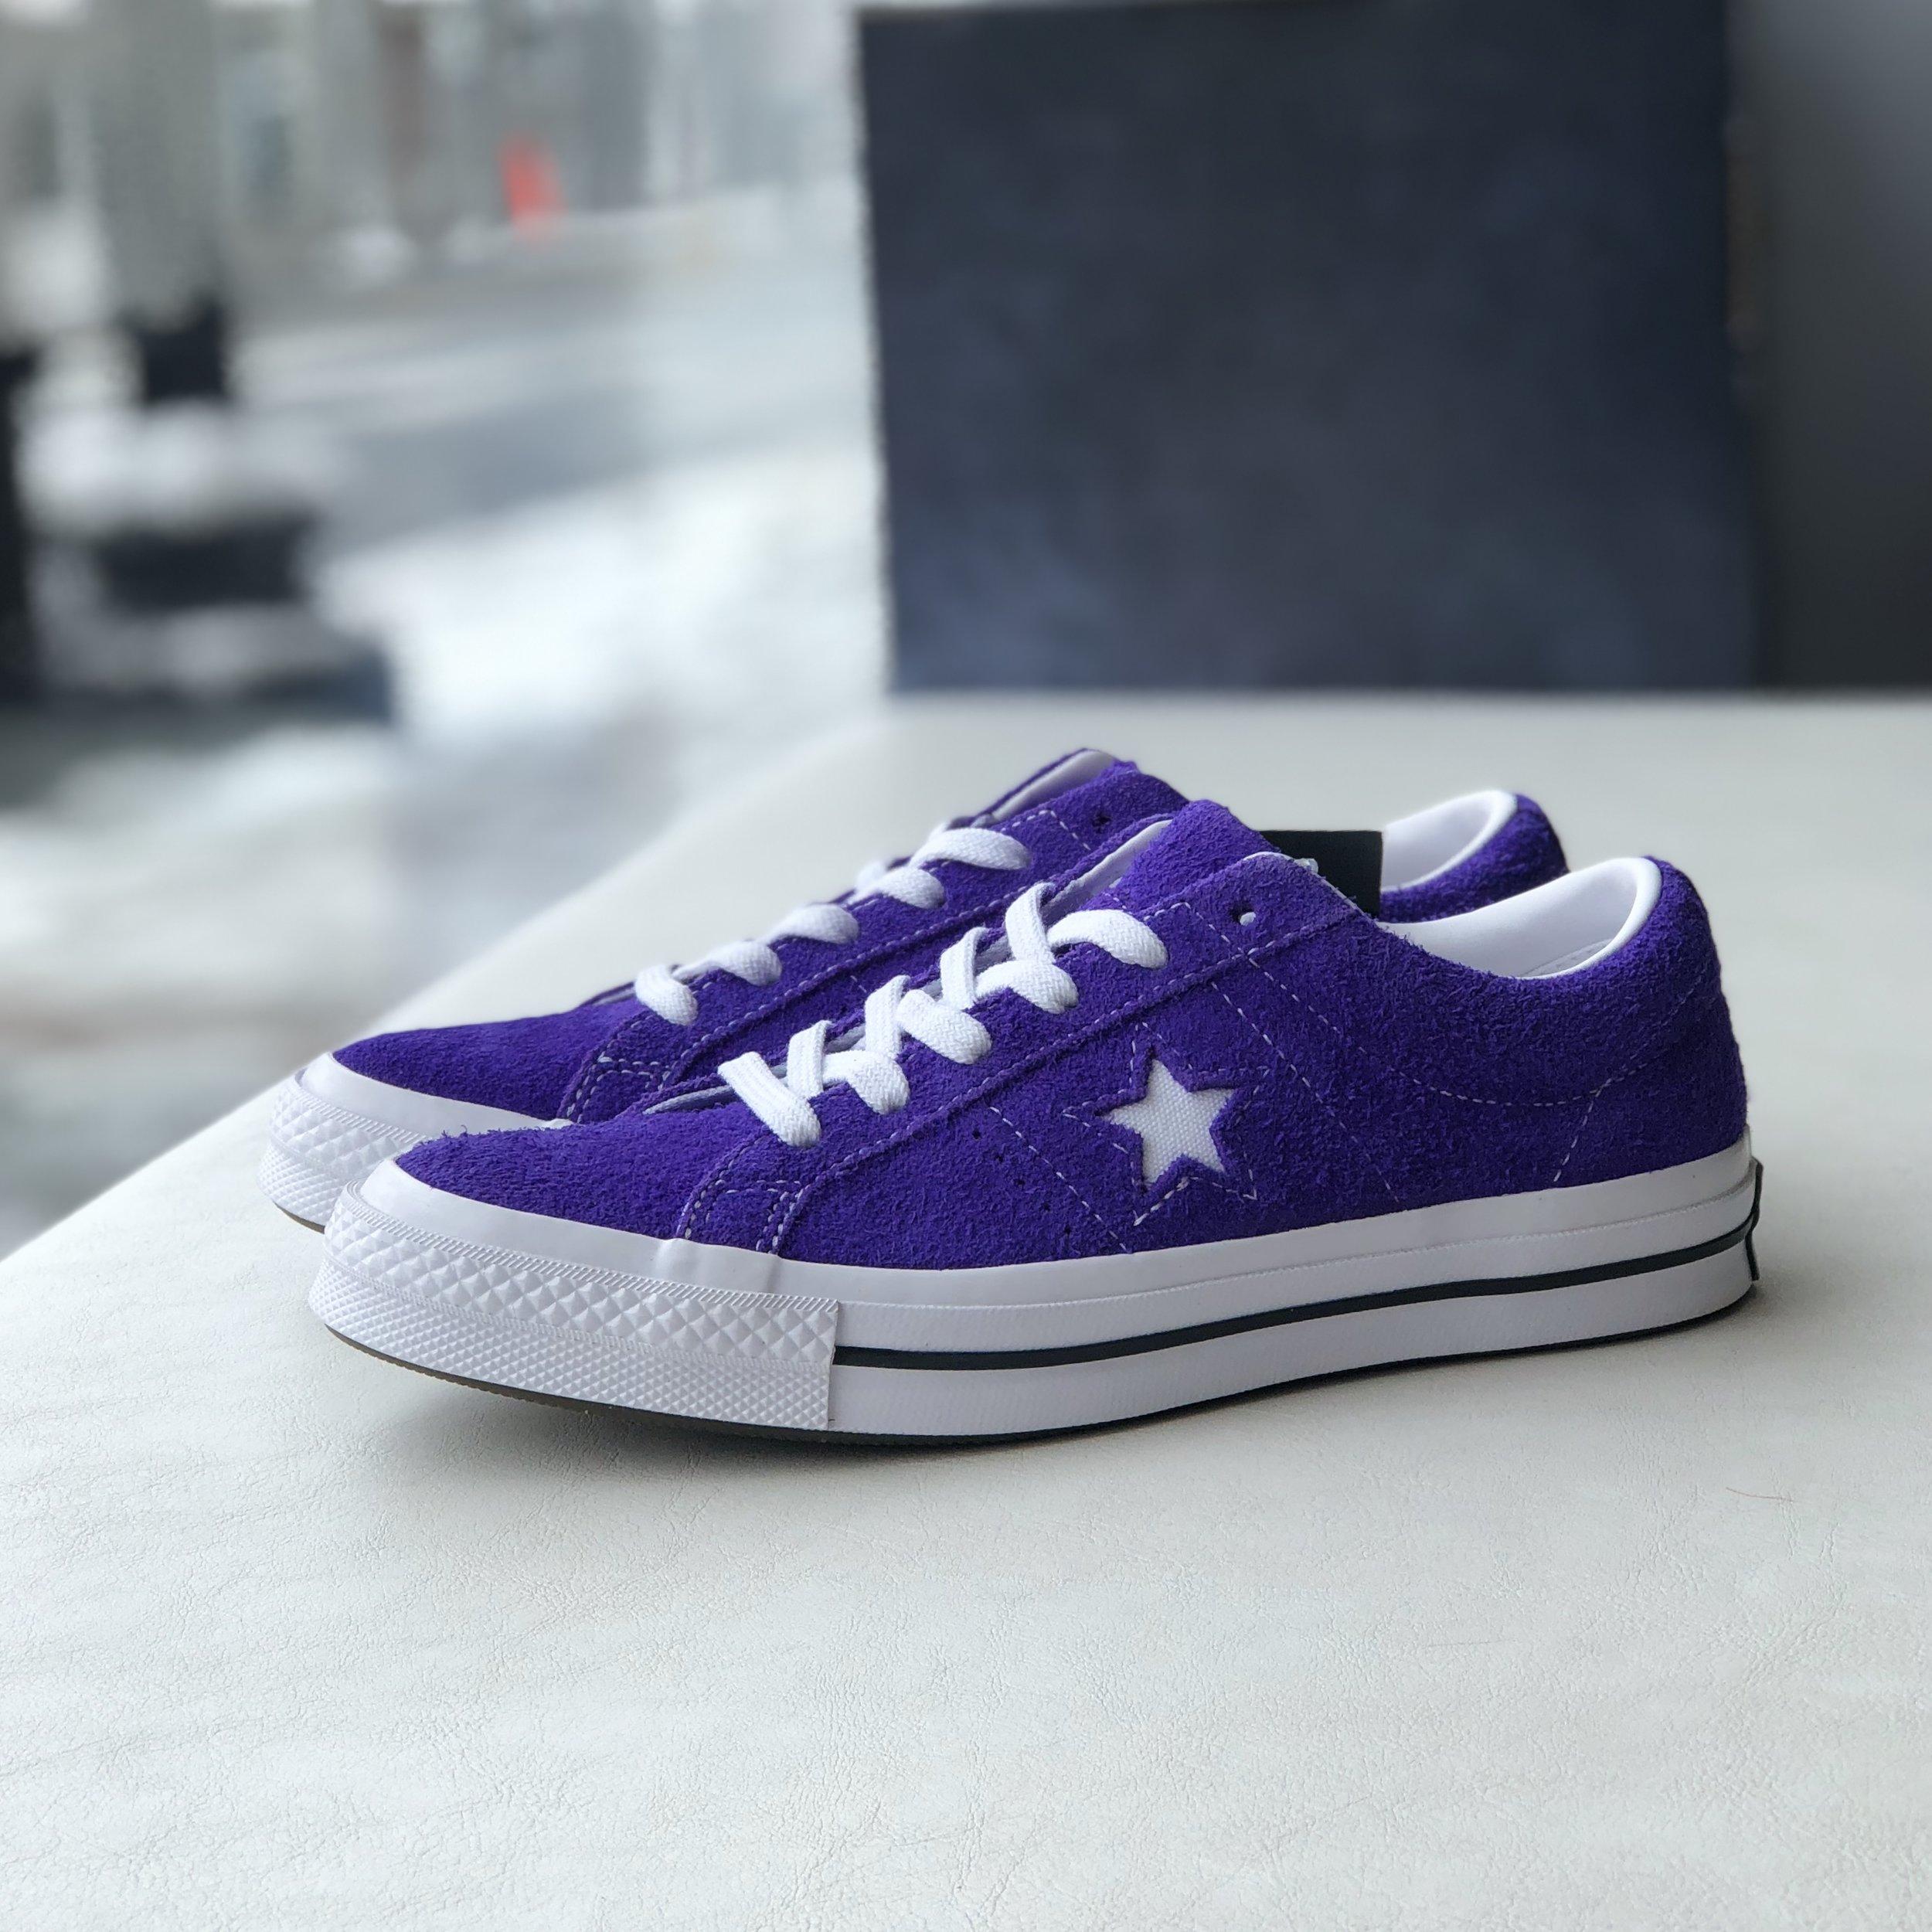 e460678822f ... good converse one star premium suede low in court purple u2014 major  bd923 46dee